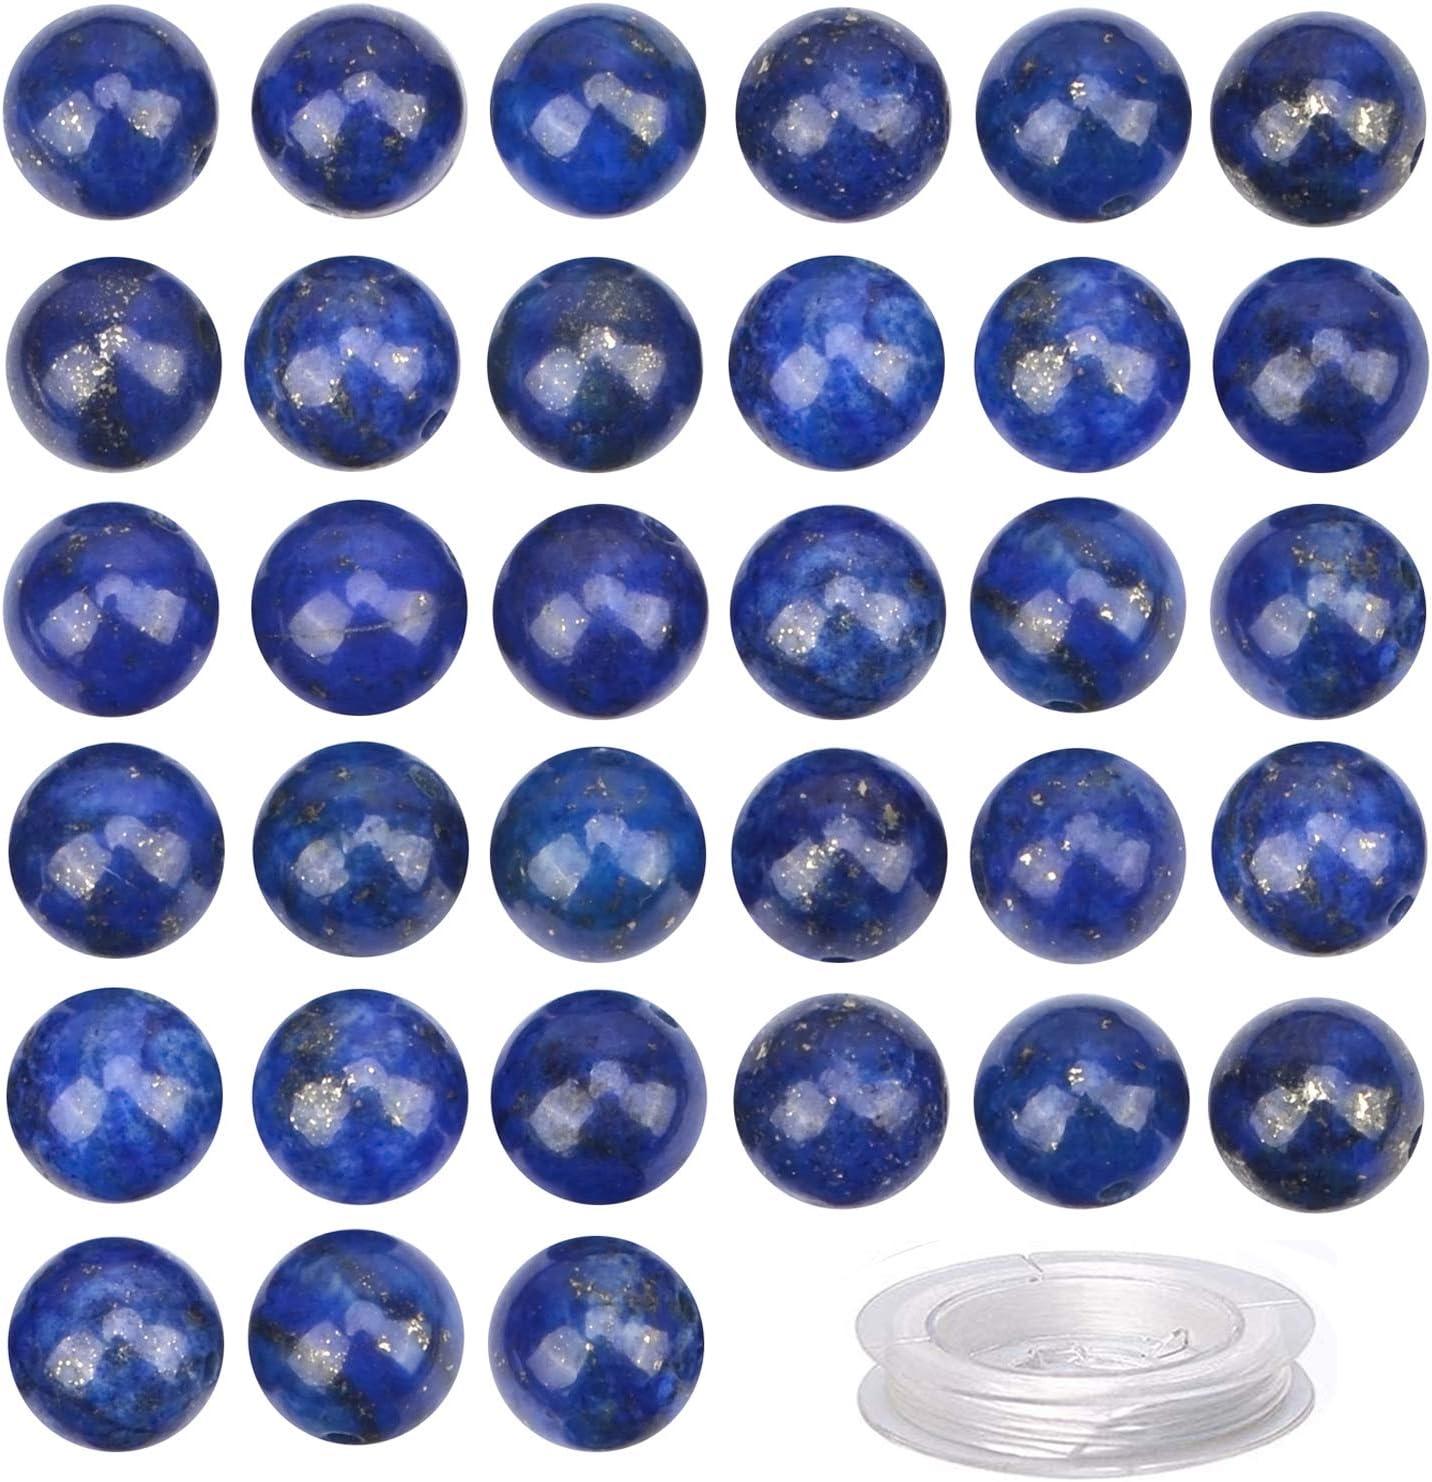 100Pcs Ranking TOP6 Natural Crystal Beads Stone Energy Gemstone favorite H Round Loose